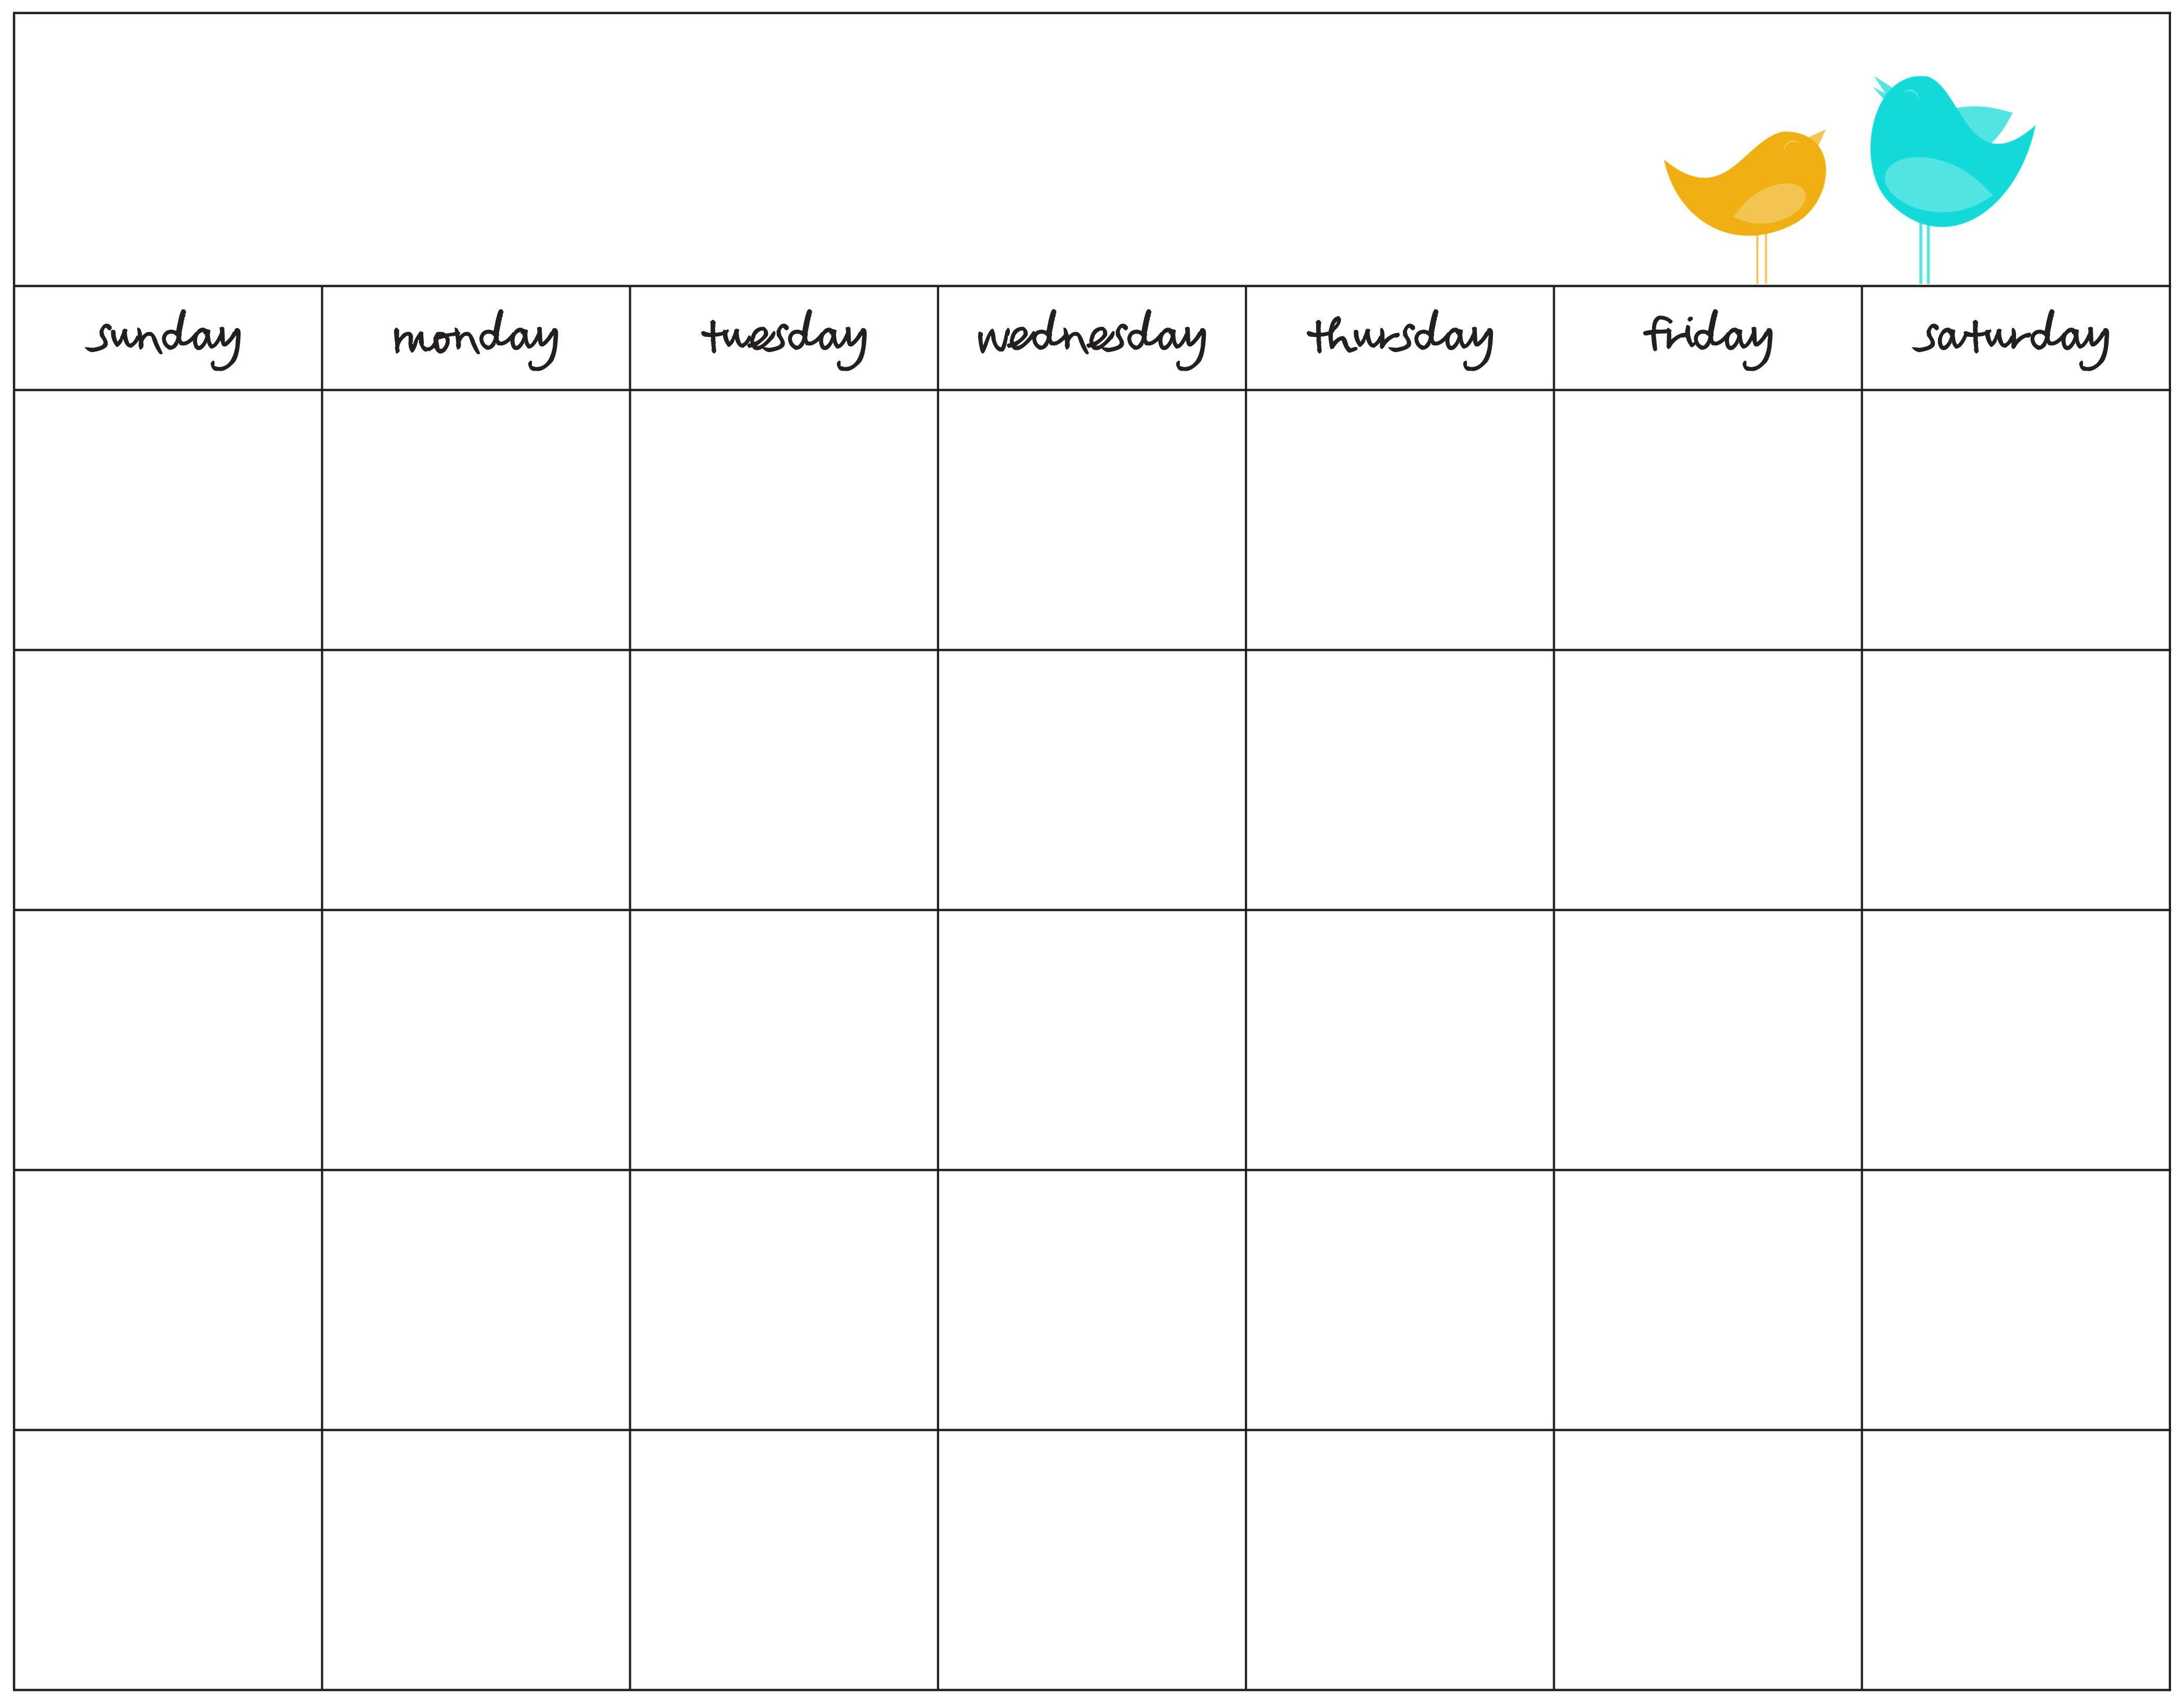 Blank Calendar Print Out | Blank Calendar | Pinterest | Blank ...